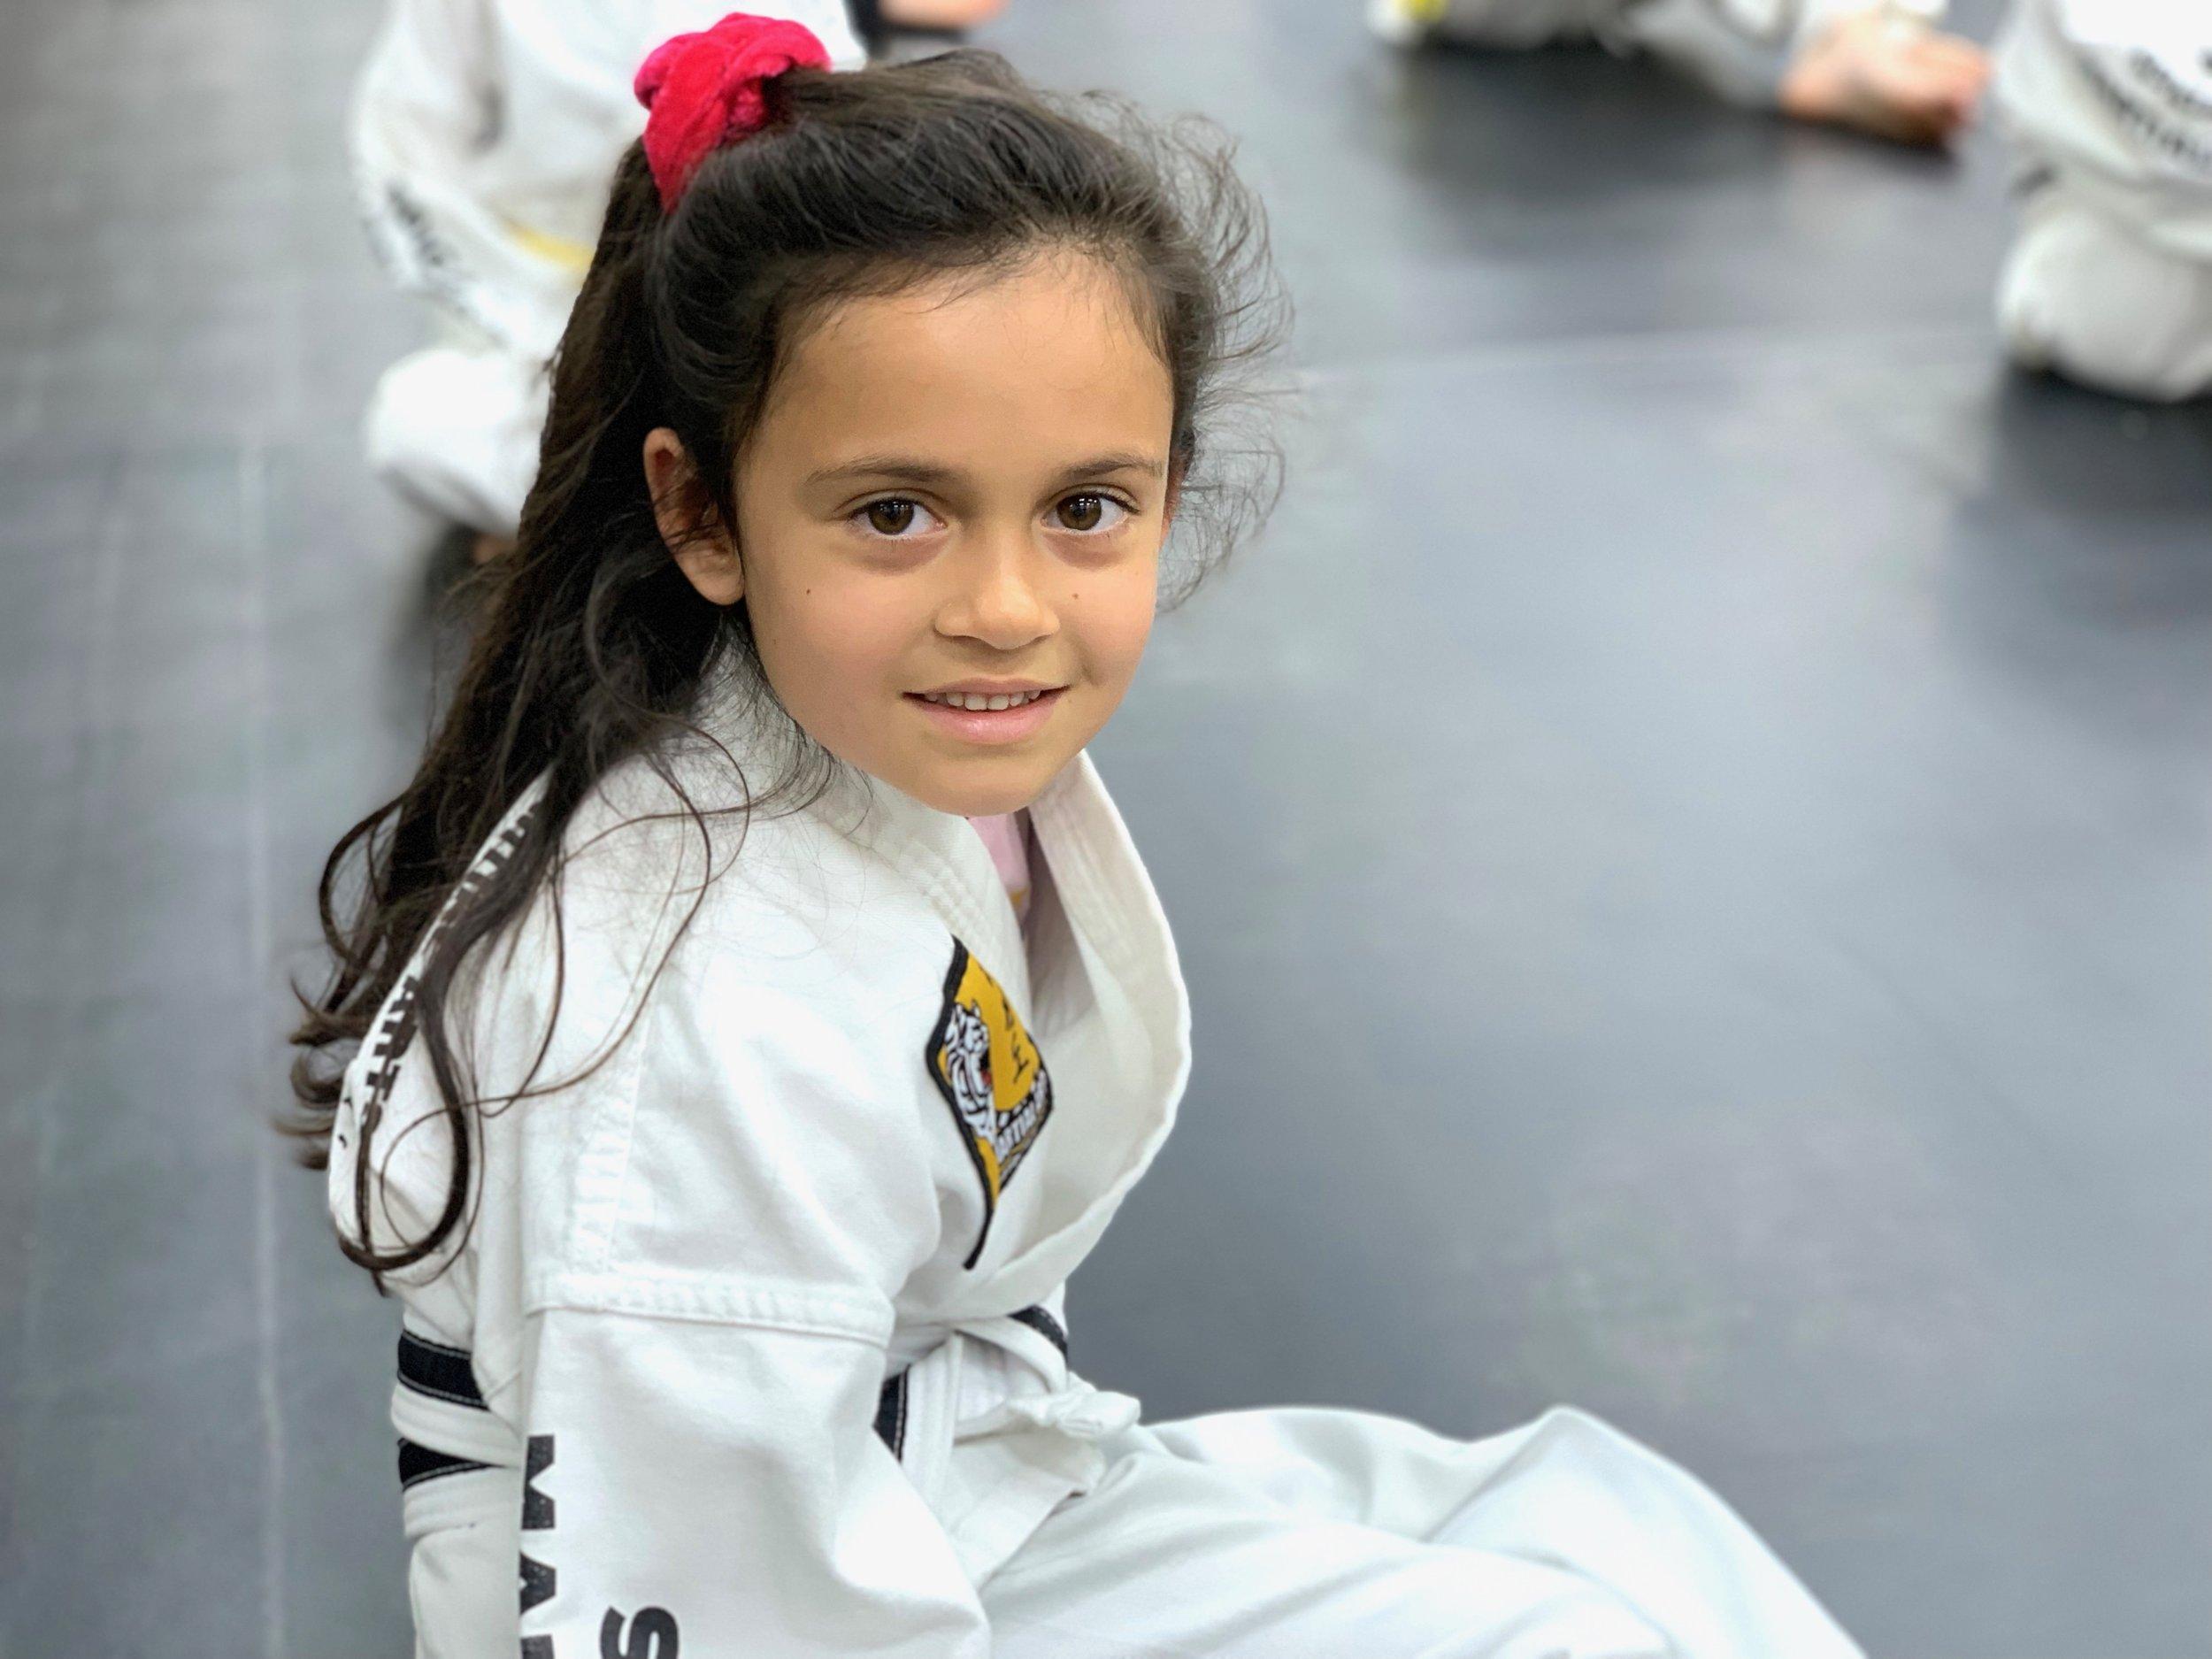 karate-kids-program-souhtlake-keller-grapevine-texas00057.jpeg